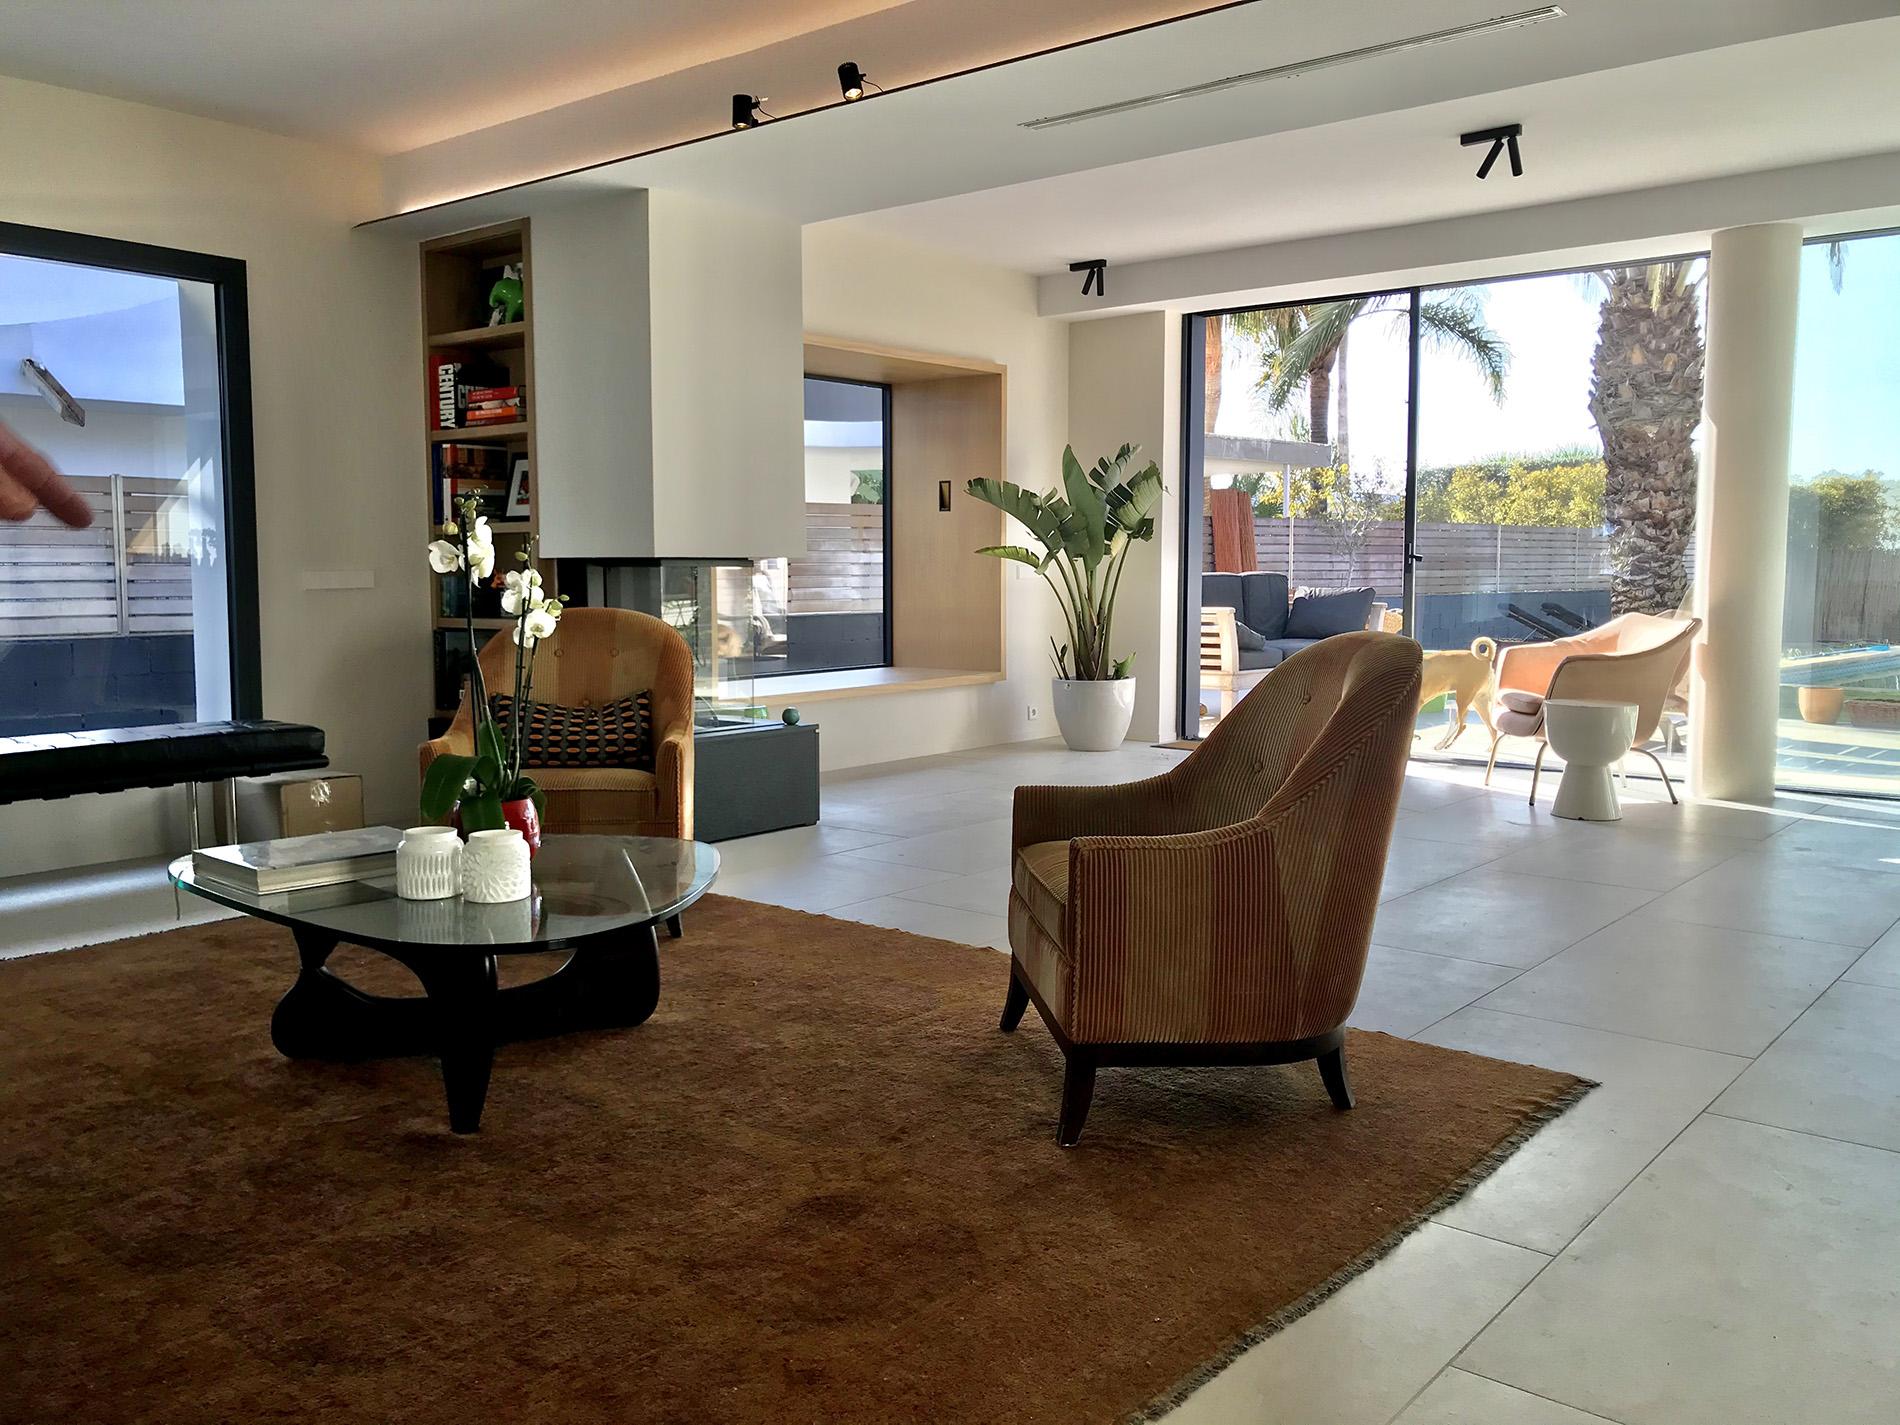 arquitectos en barcelona sitges full refurbishment single storie house in valpineda IV